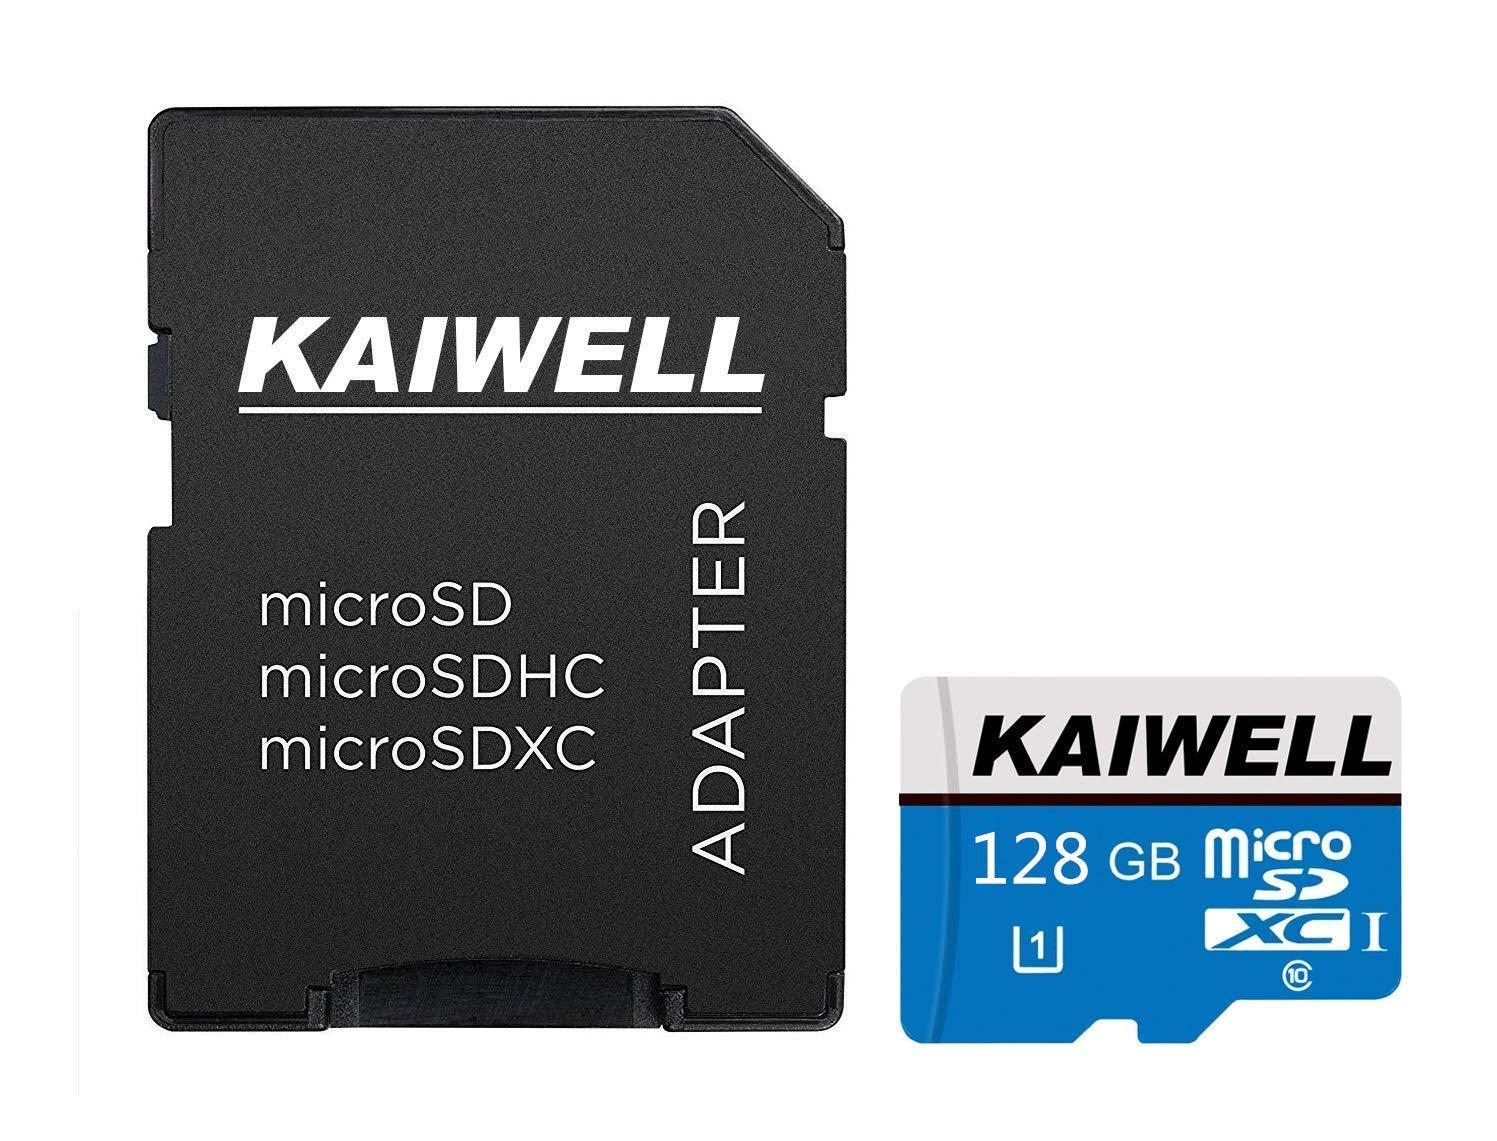 KAIWELL - Tarjeta de Memoria Micro SD SDXC con Adaptador (128 GB, 256 GB, 400 GB, Clase 10) 400GB